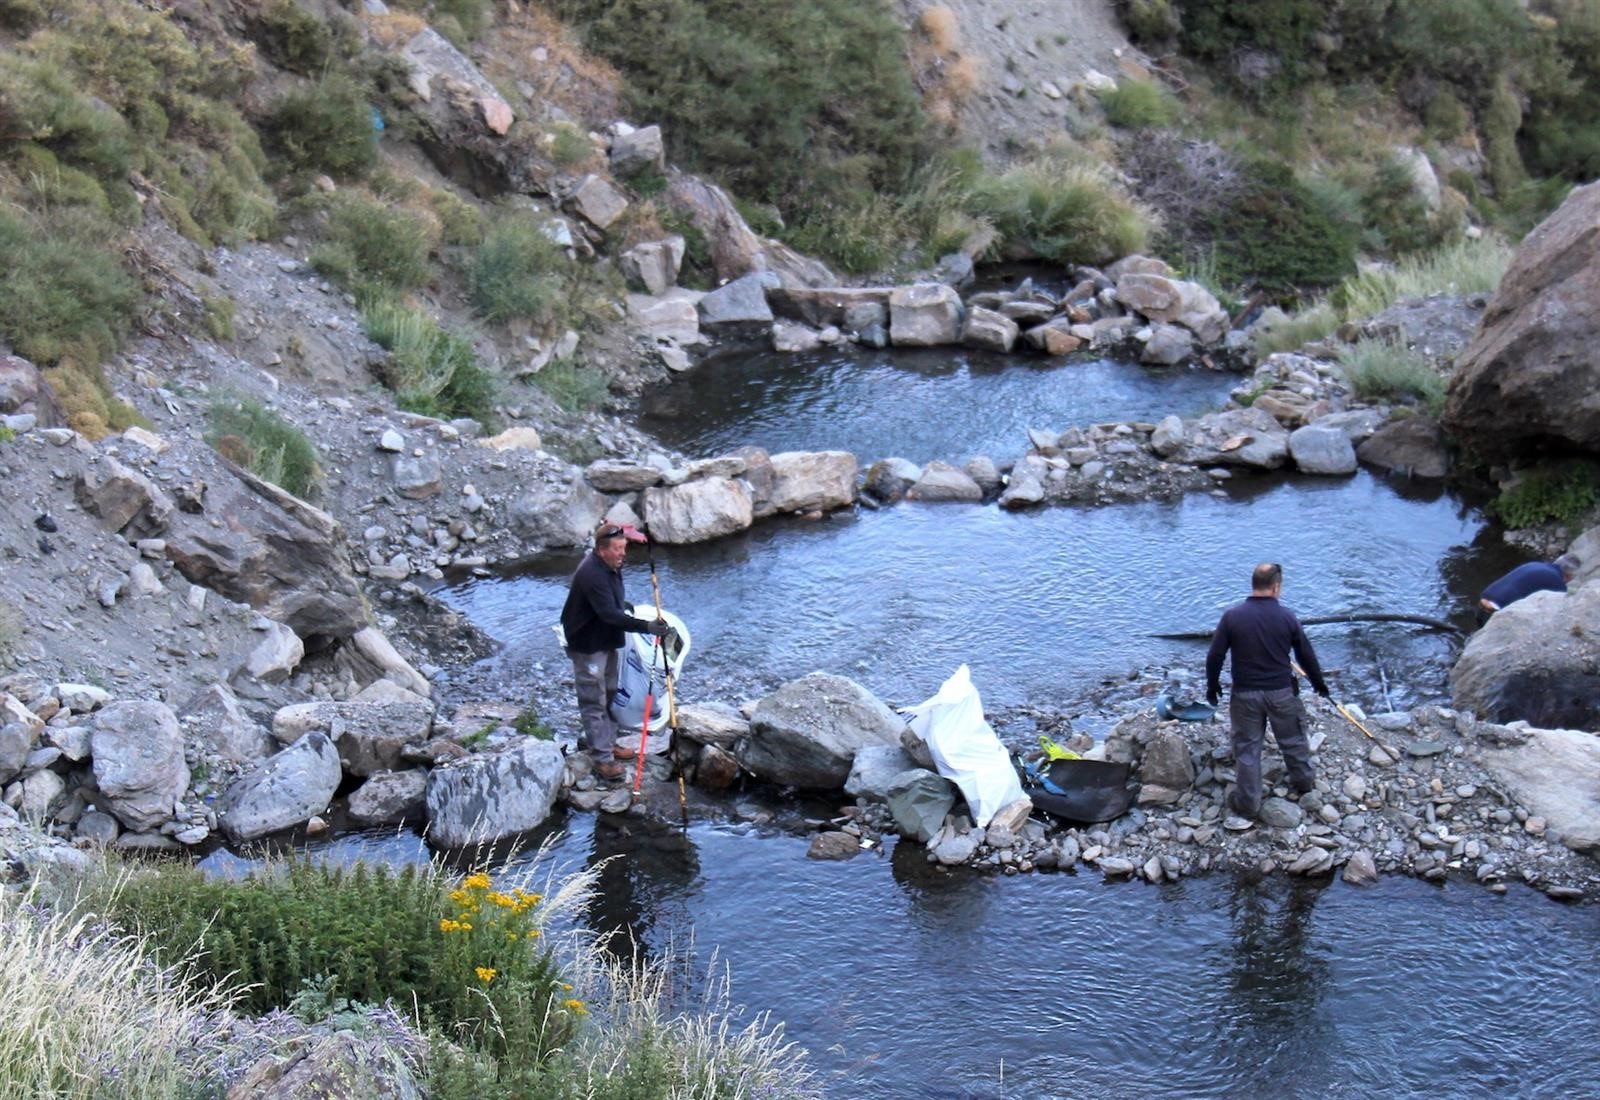 Sierra Nevada alberga el sistema de recarga de agua subterránea más antiguo de Europa